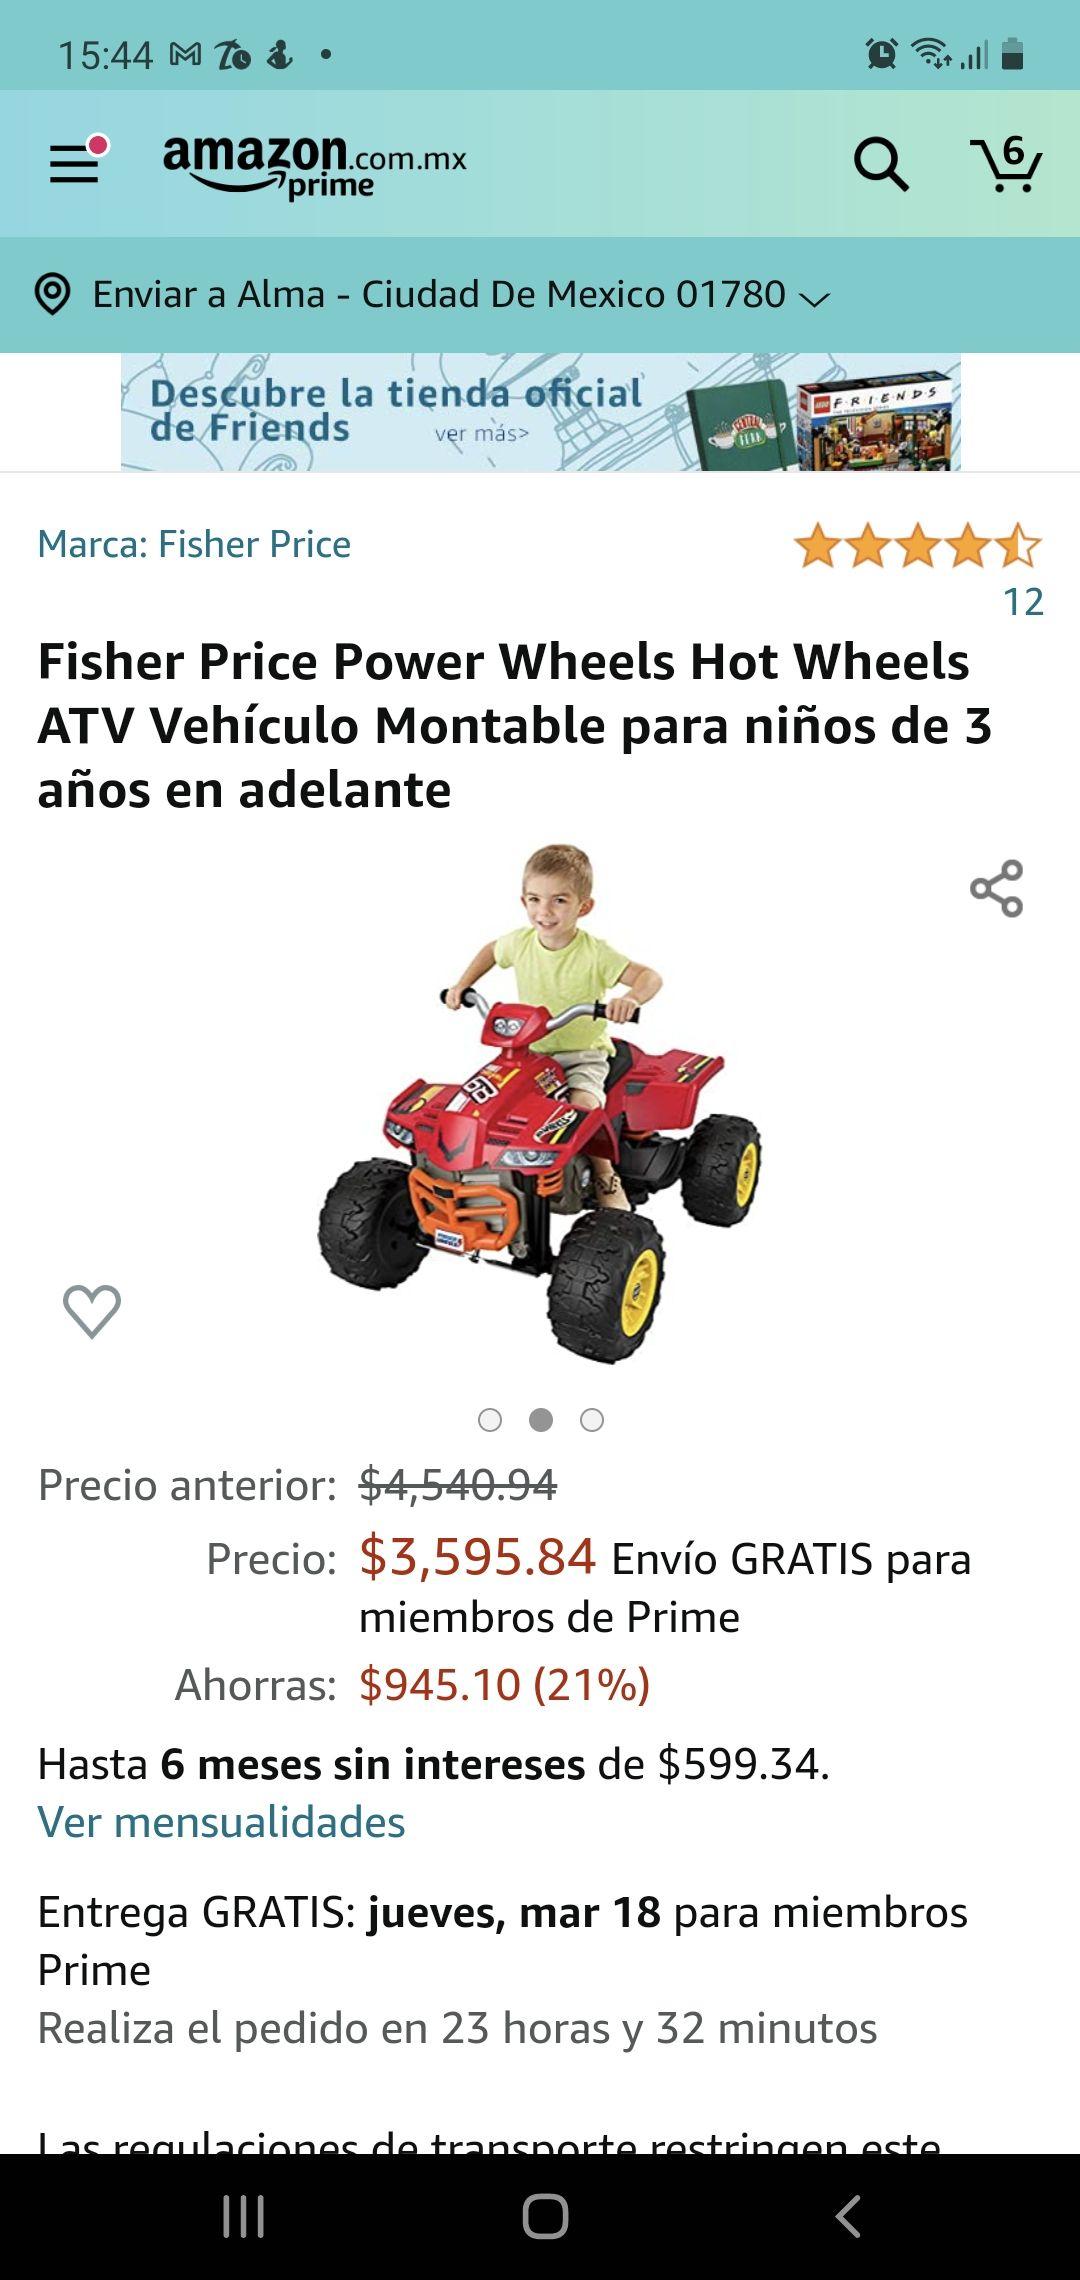 Amazon: Fisher Price Power Wheels Hot Wheels ATV Vehículo Montable para niños